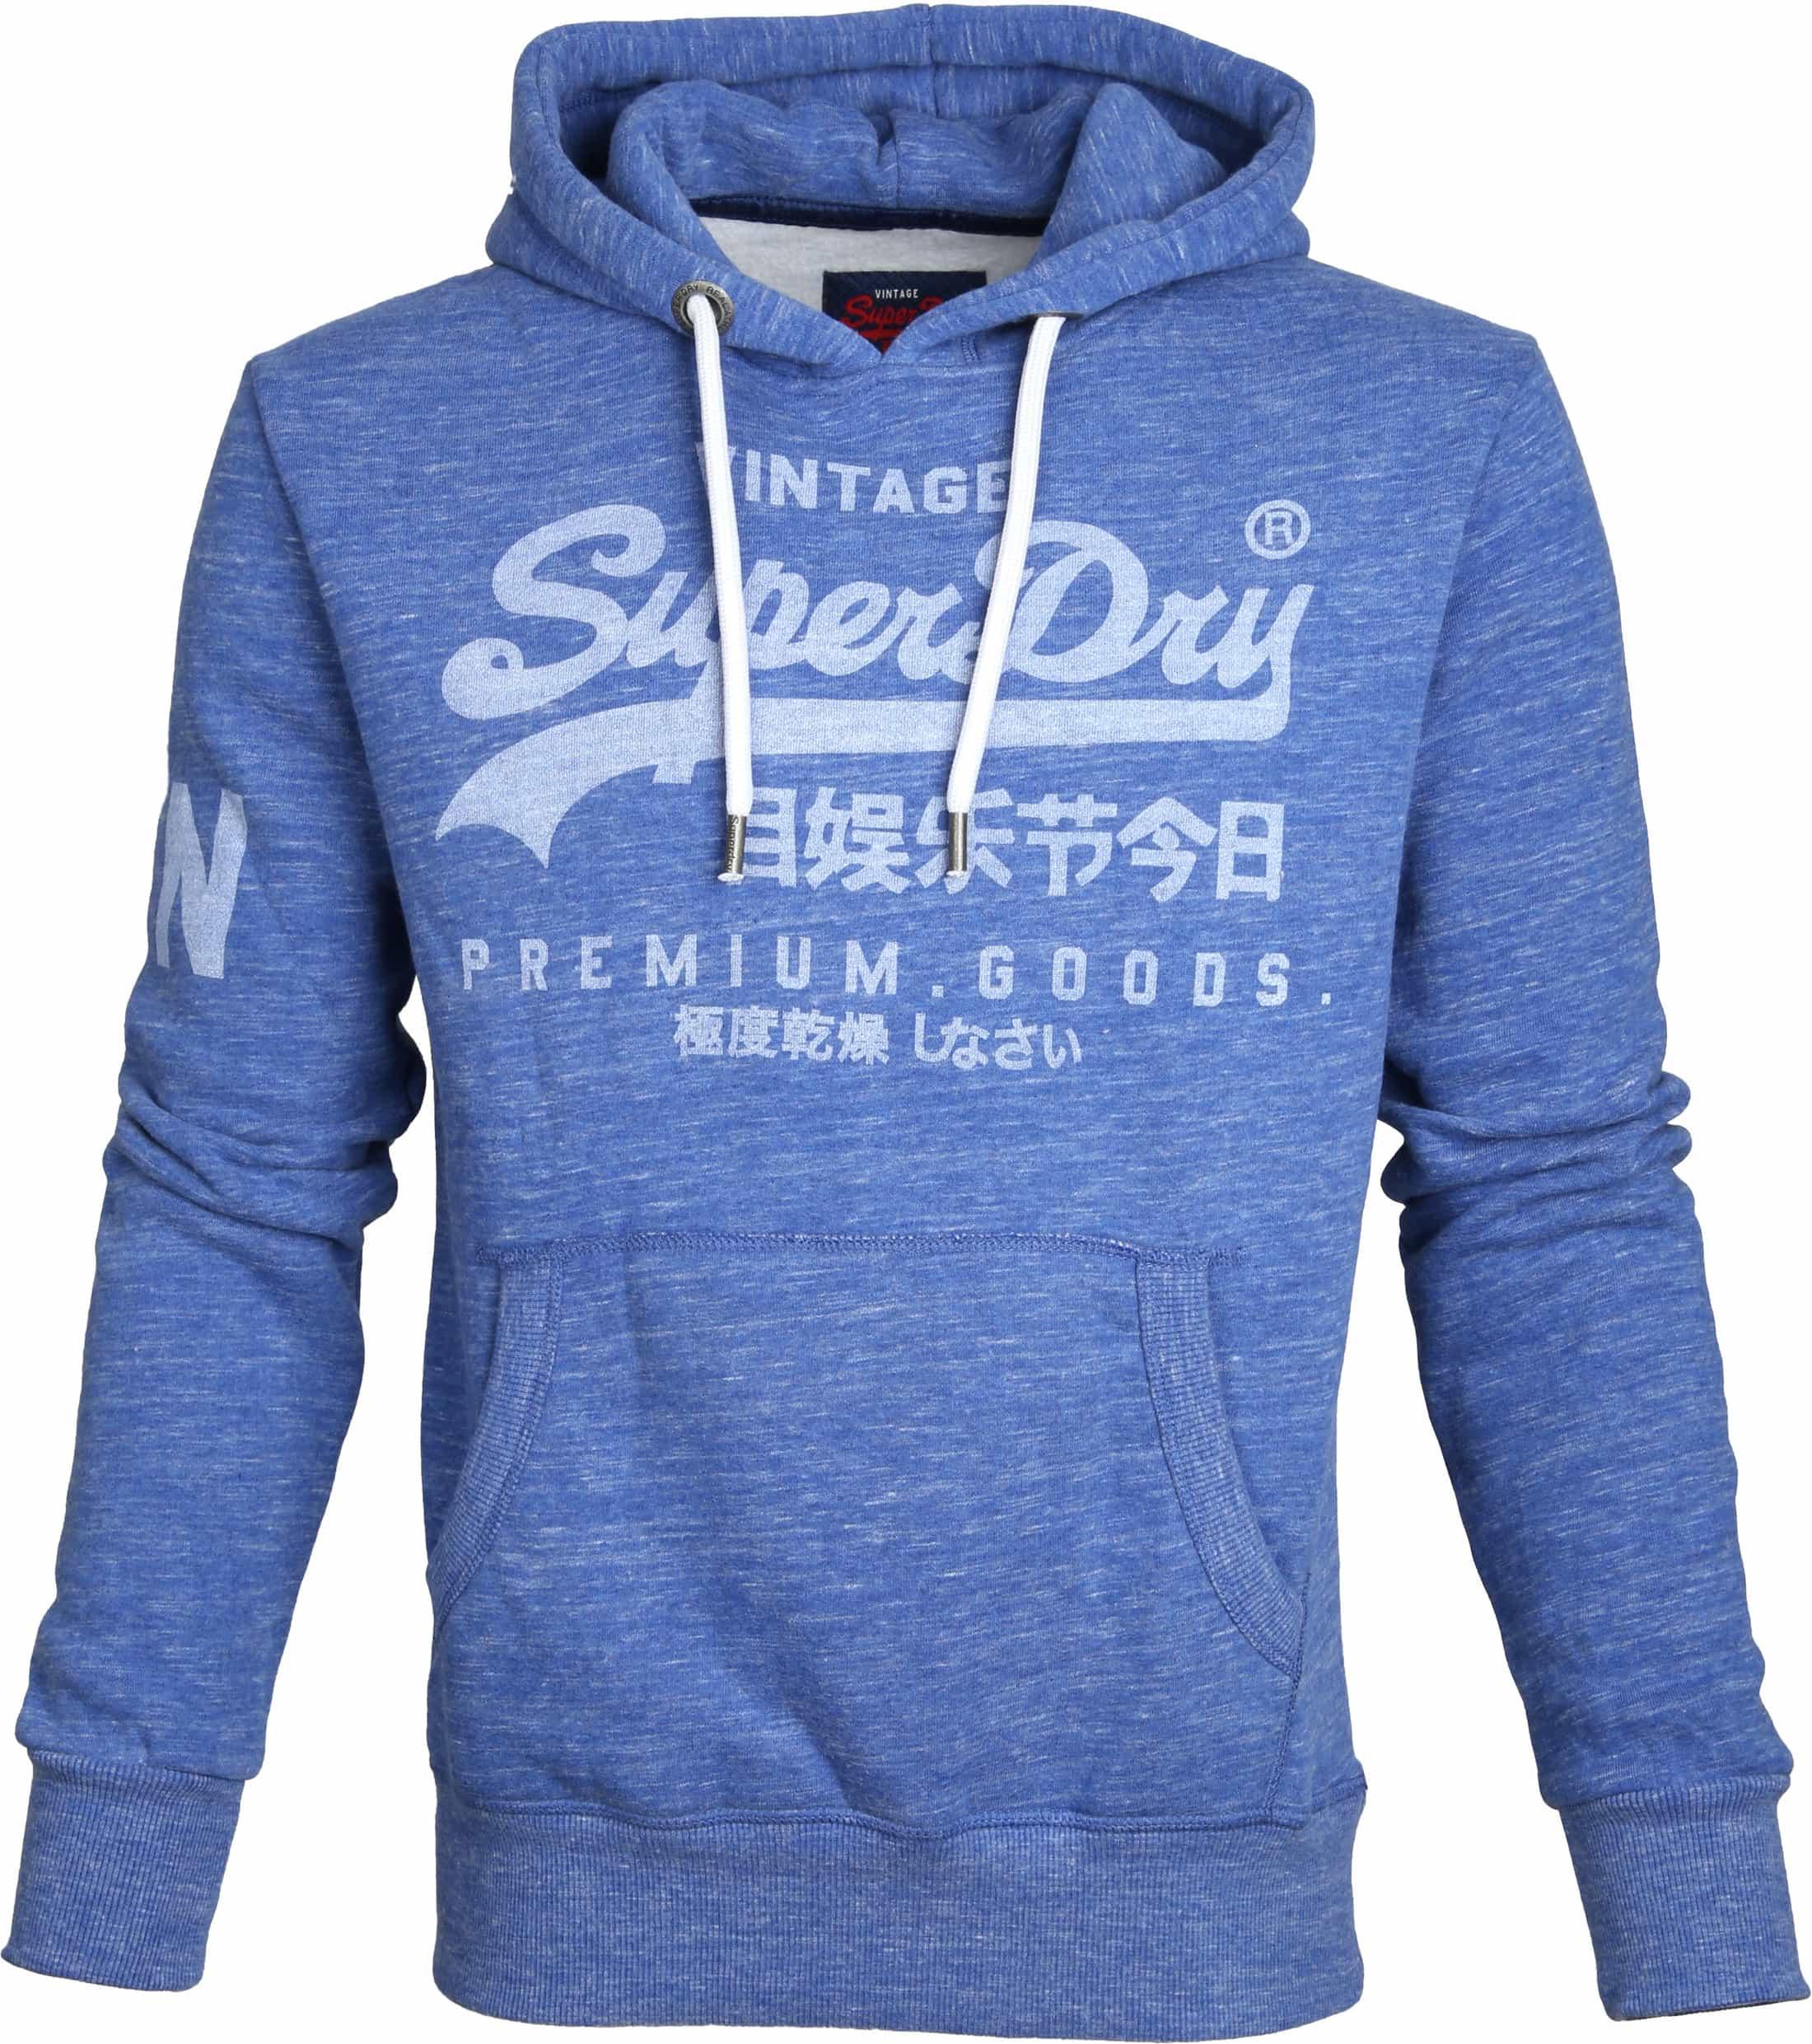 Superdry Sweater Logo Vintage Blau M20000NR online kaufen   Suitable 40933093c1